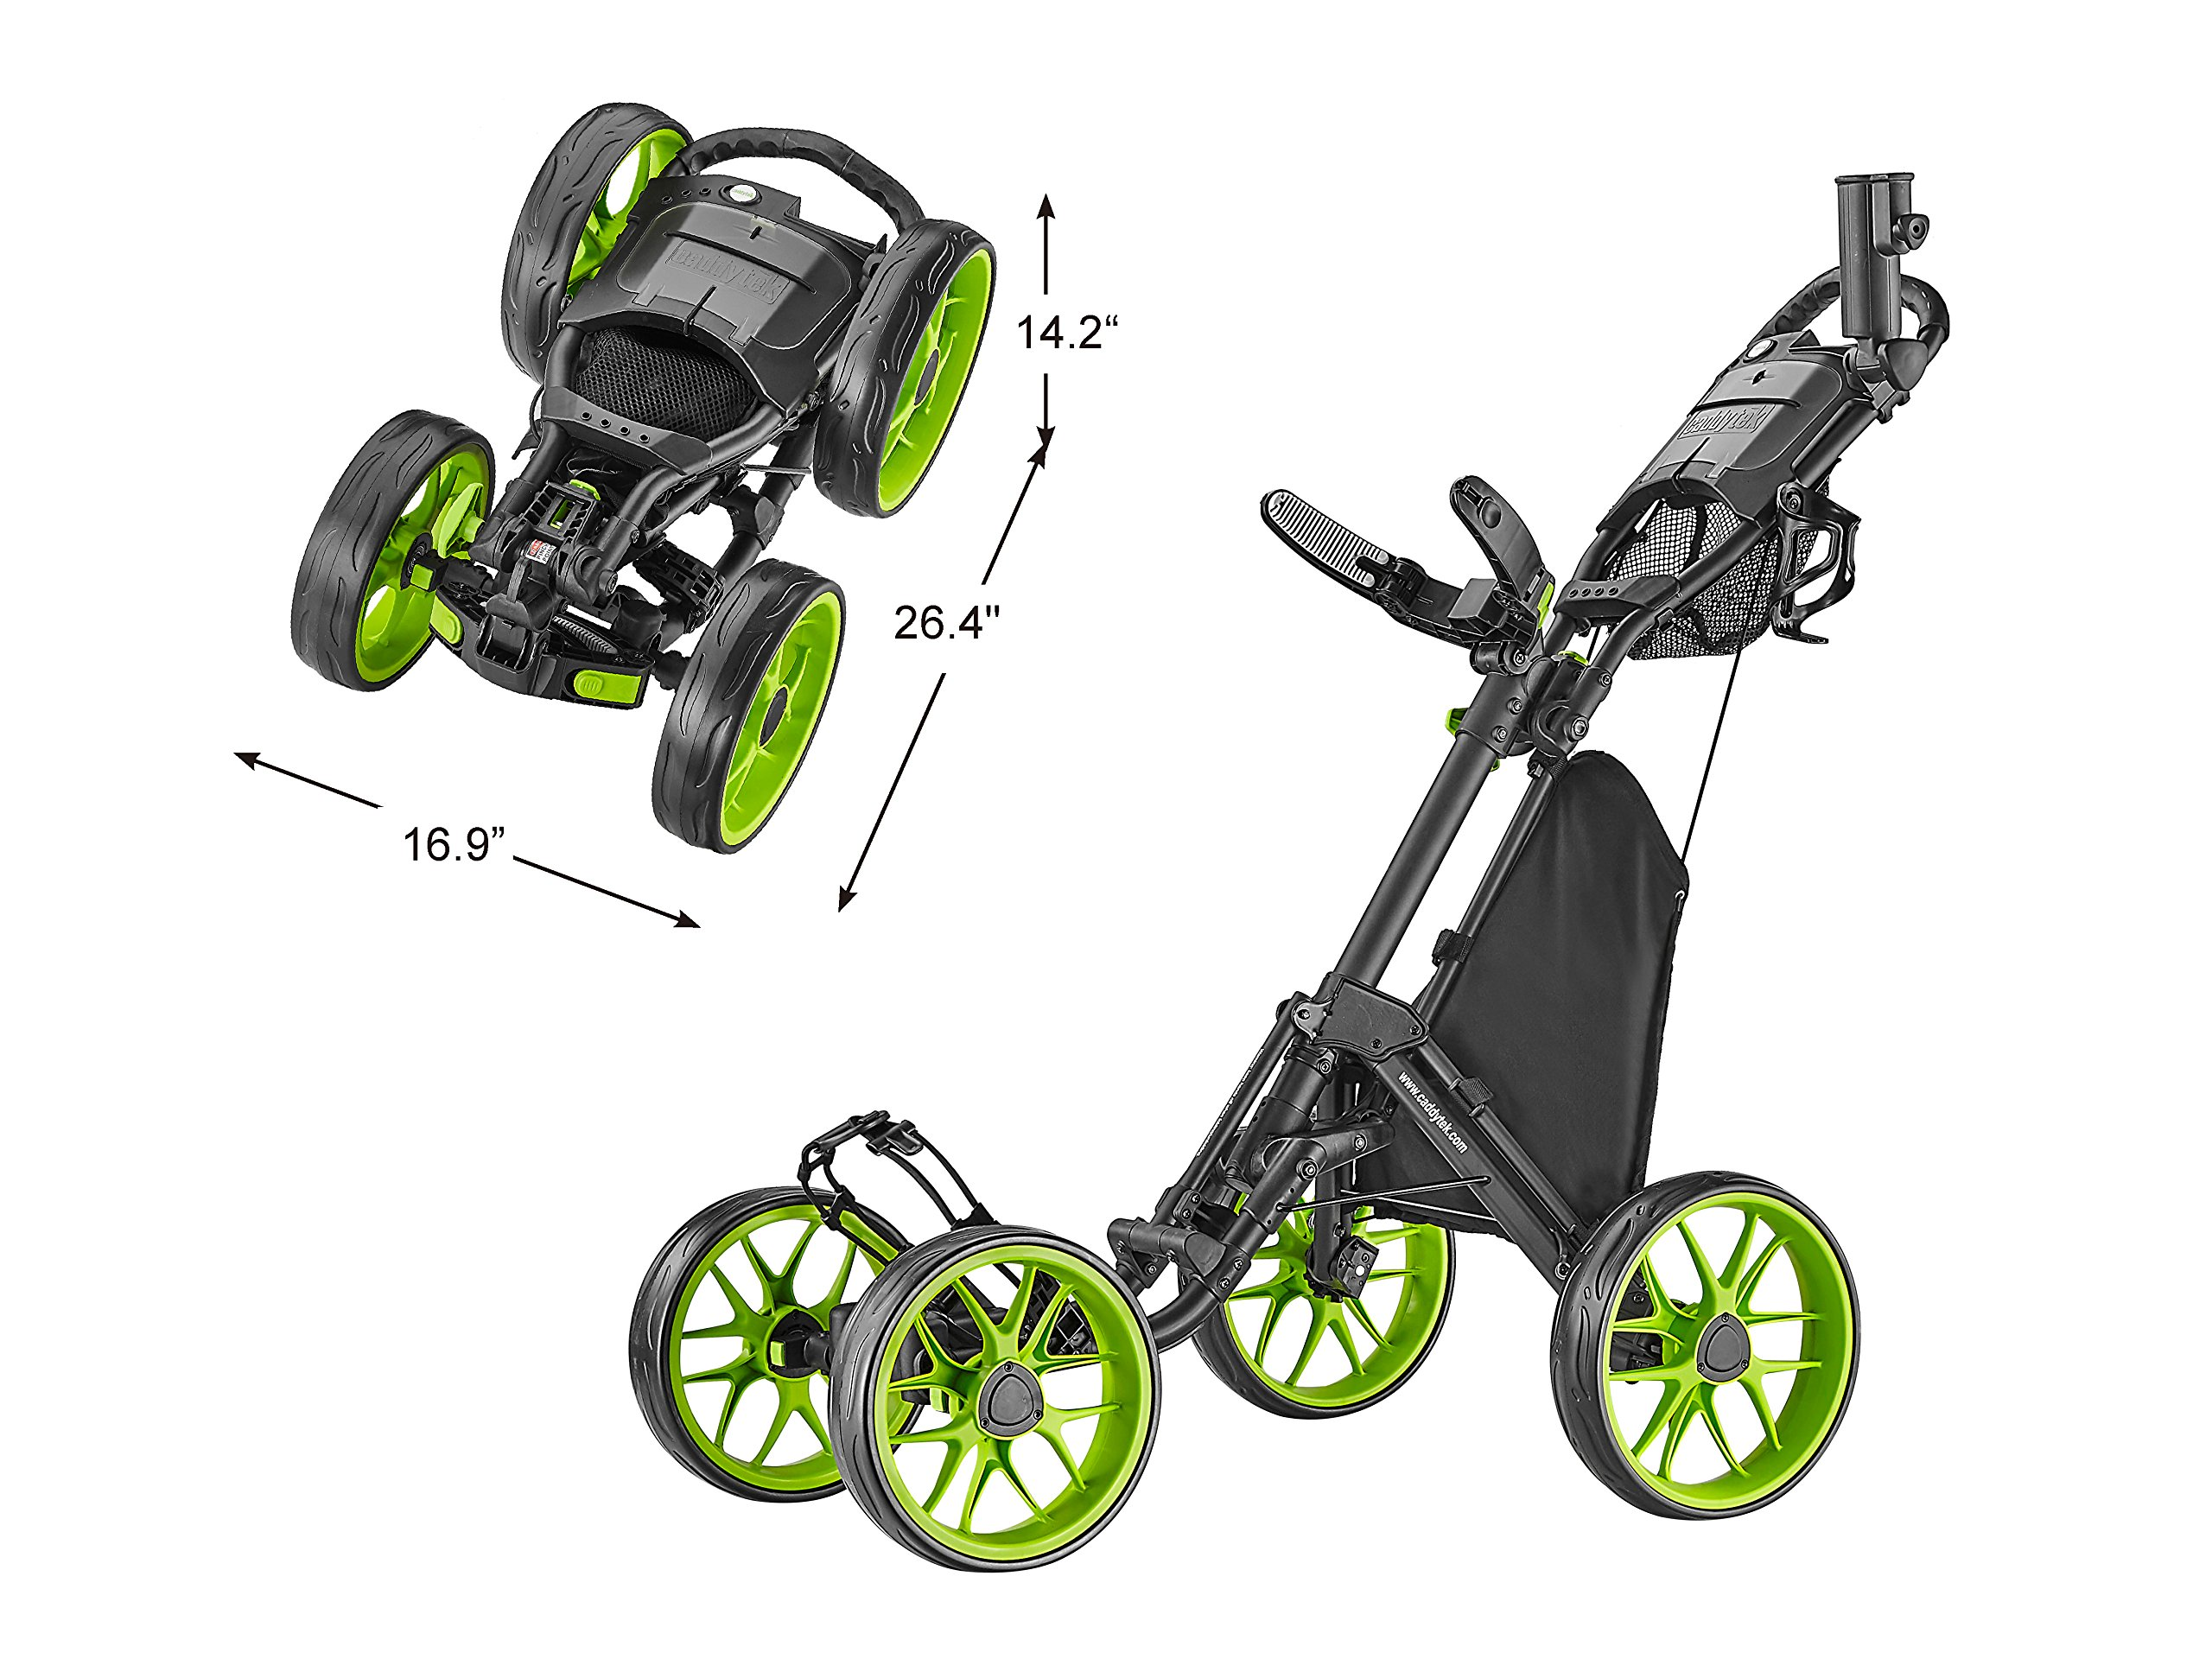 CaddyTek Caddycruiser One Version 8 - One-Click Folding 4 Wheel Golf Push Cart, Lime by CaddyTek